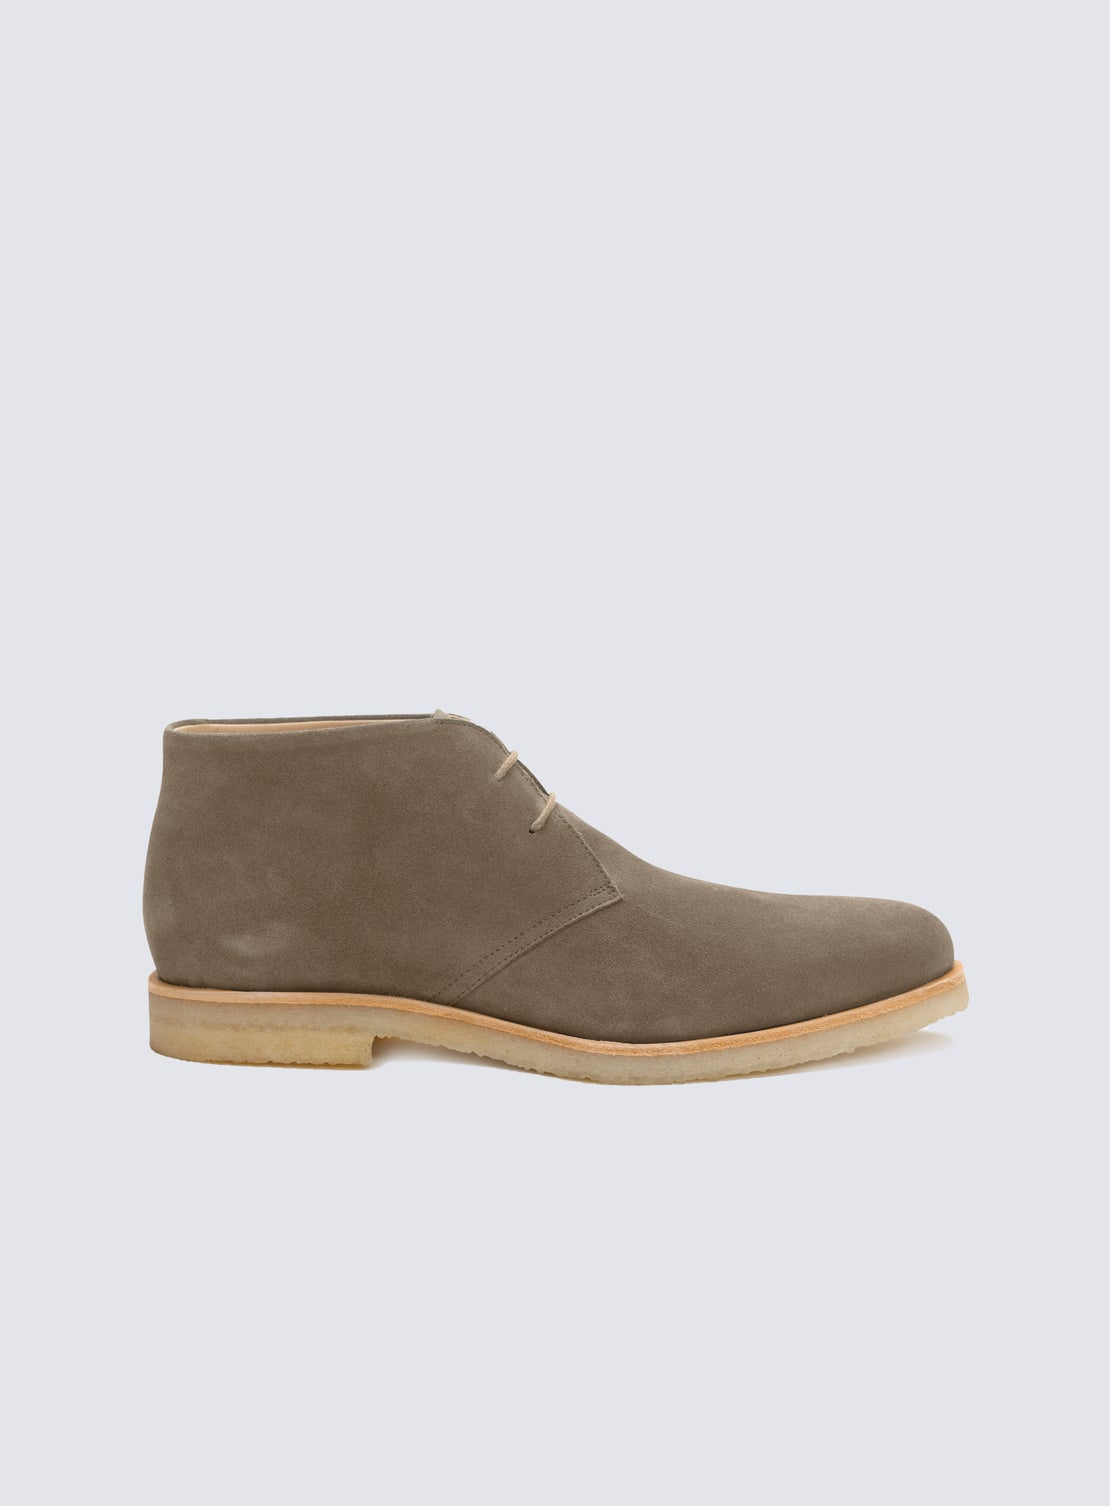 Morrissey Mushroom Suede Desert Boot